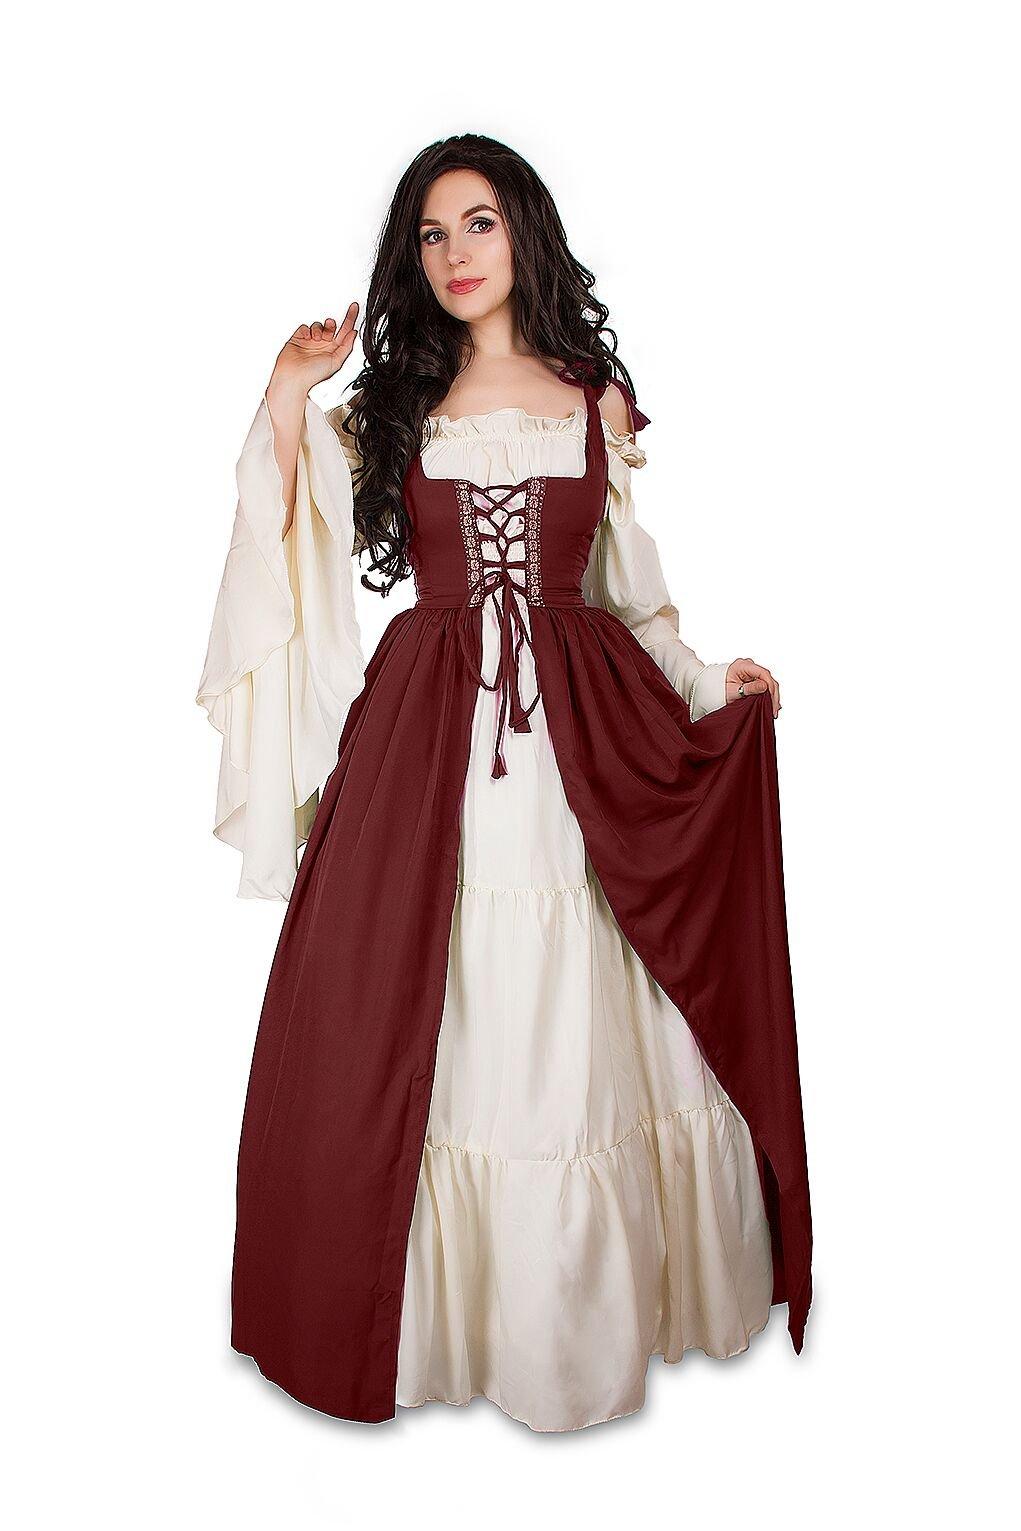 Mythic Renaissance Medieval Irish Costume Over Dress & Cream Chemise Set (L/XL, Burgundy) by Reminisce